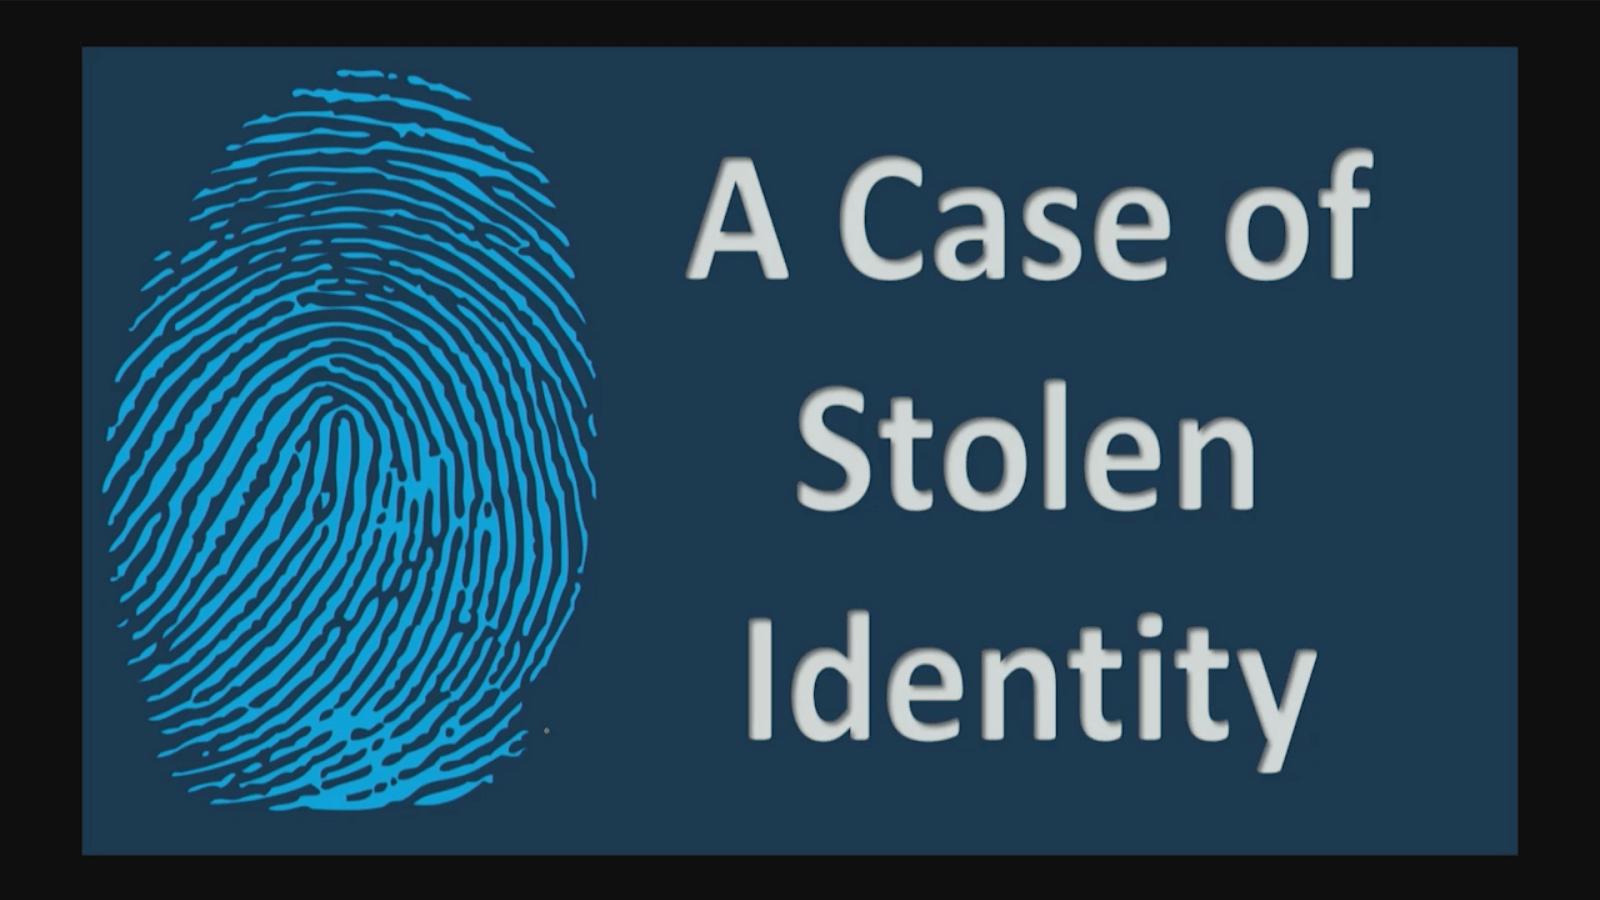 A Case of Stolen Identity